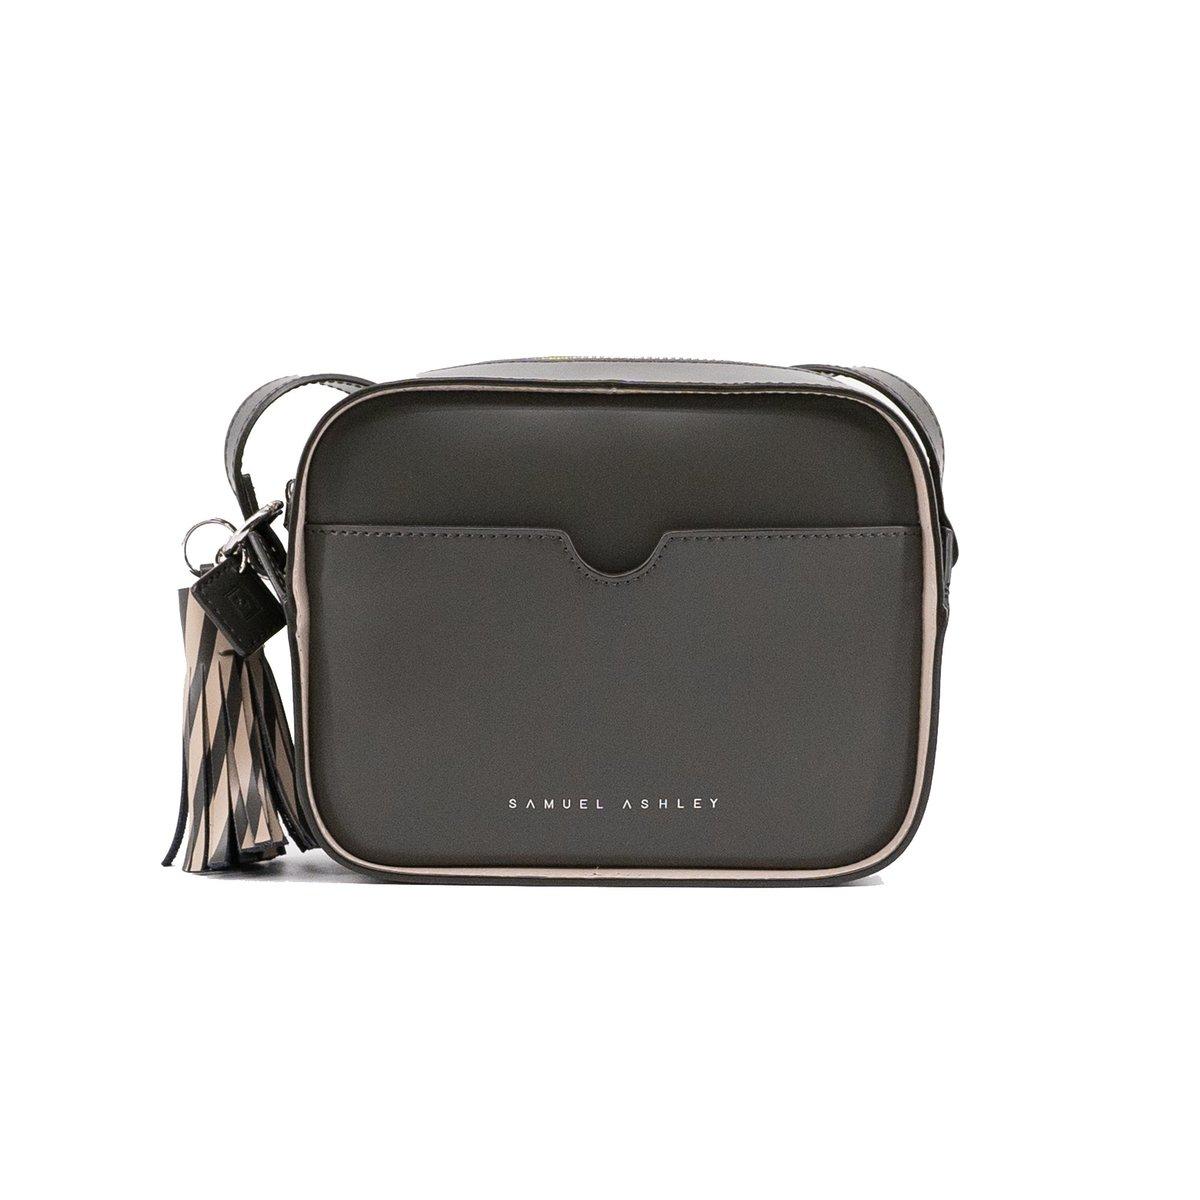 Posie Camera Bag - Pine